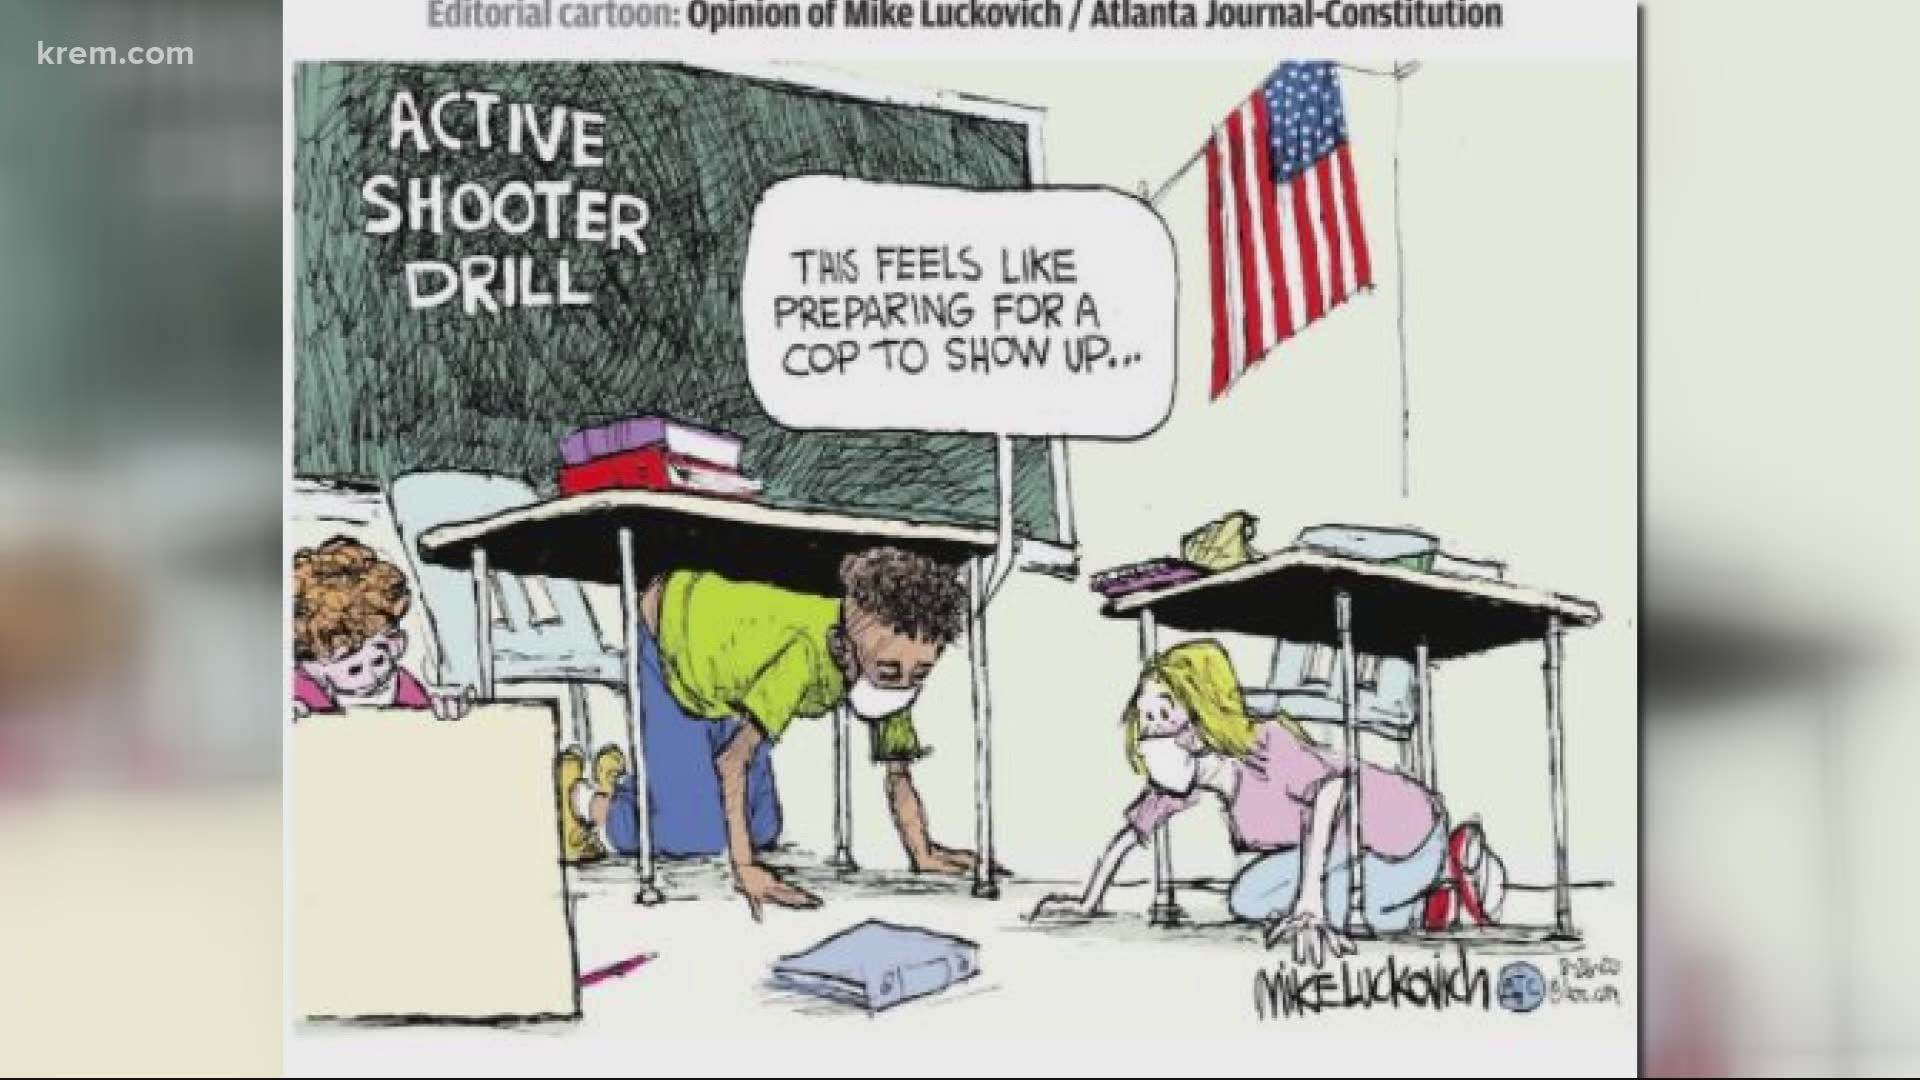 Lewiston Tribune Apologizes For Cartoon About Police Violence Krem Com